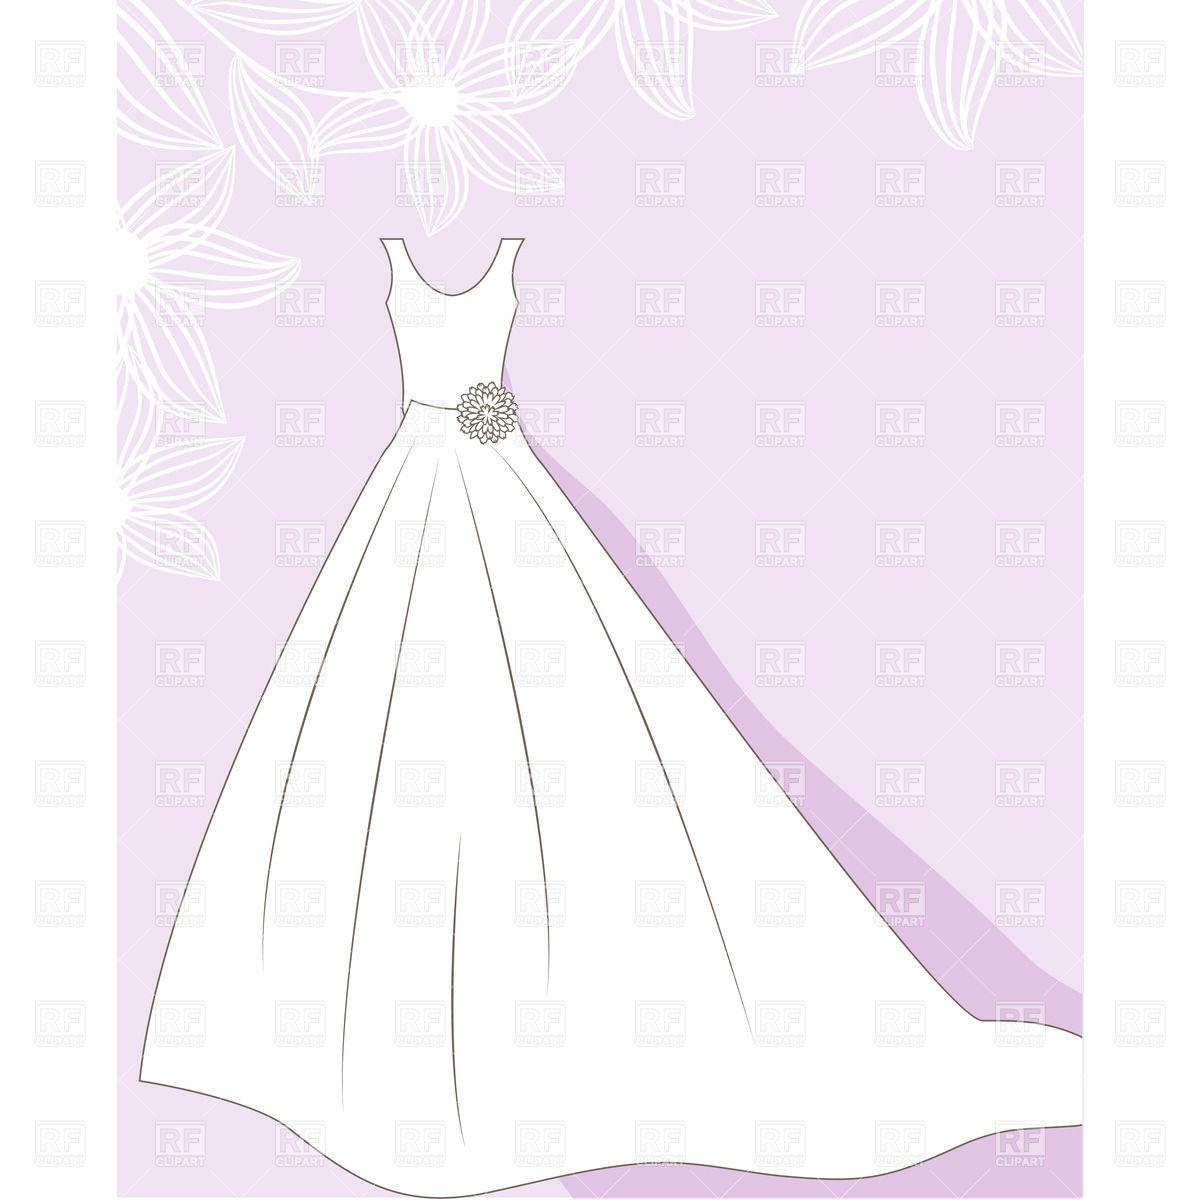 Clipart wedding dress clipart jpg royalty free library Wedding dress on hanger free clip art - ClipartFest jpg royalty free library